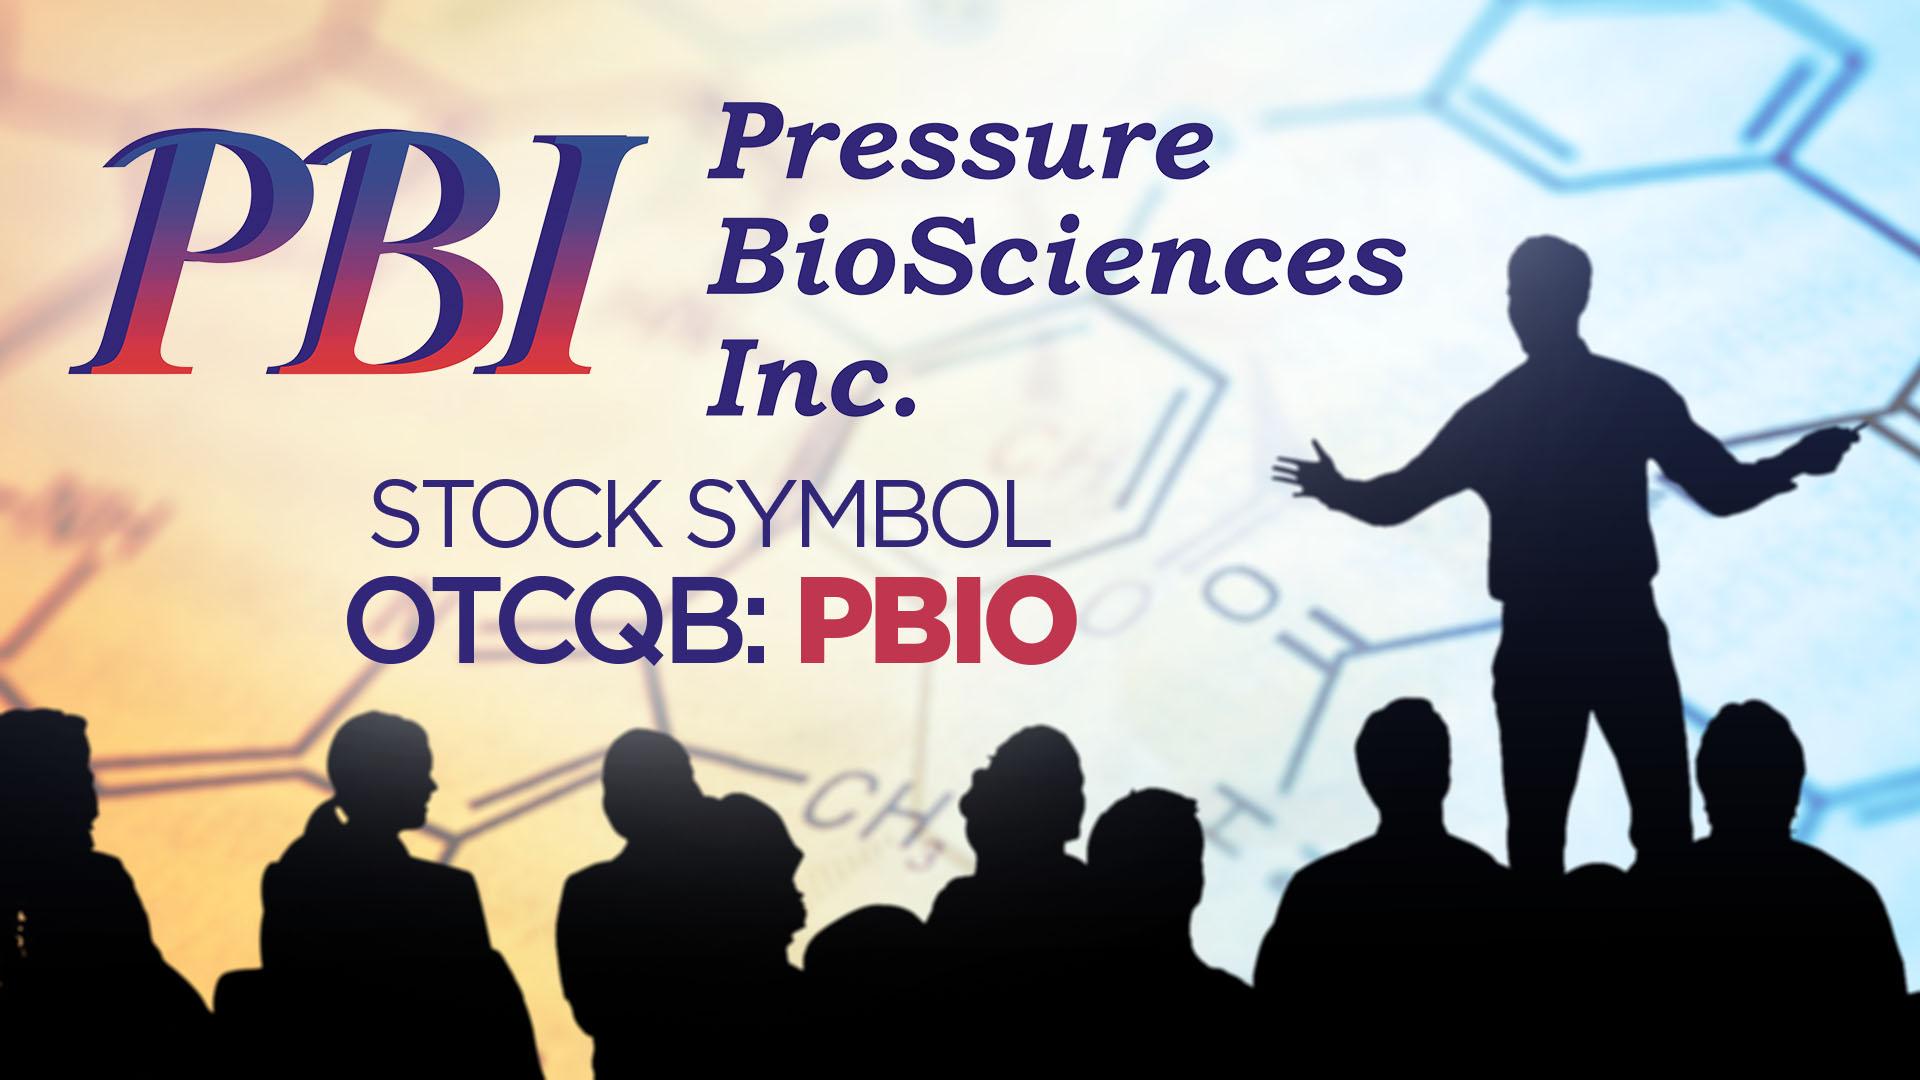 Pressure BioSciences Webcast